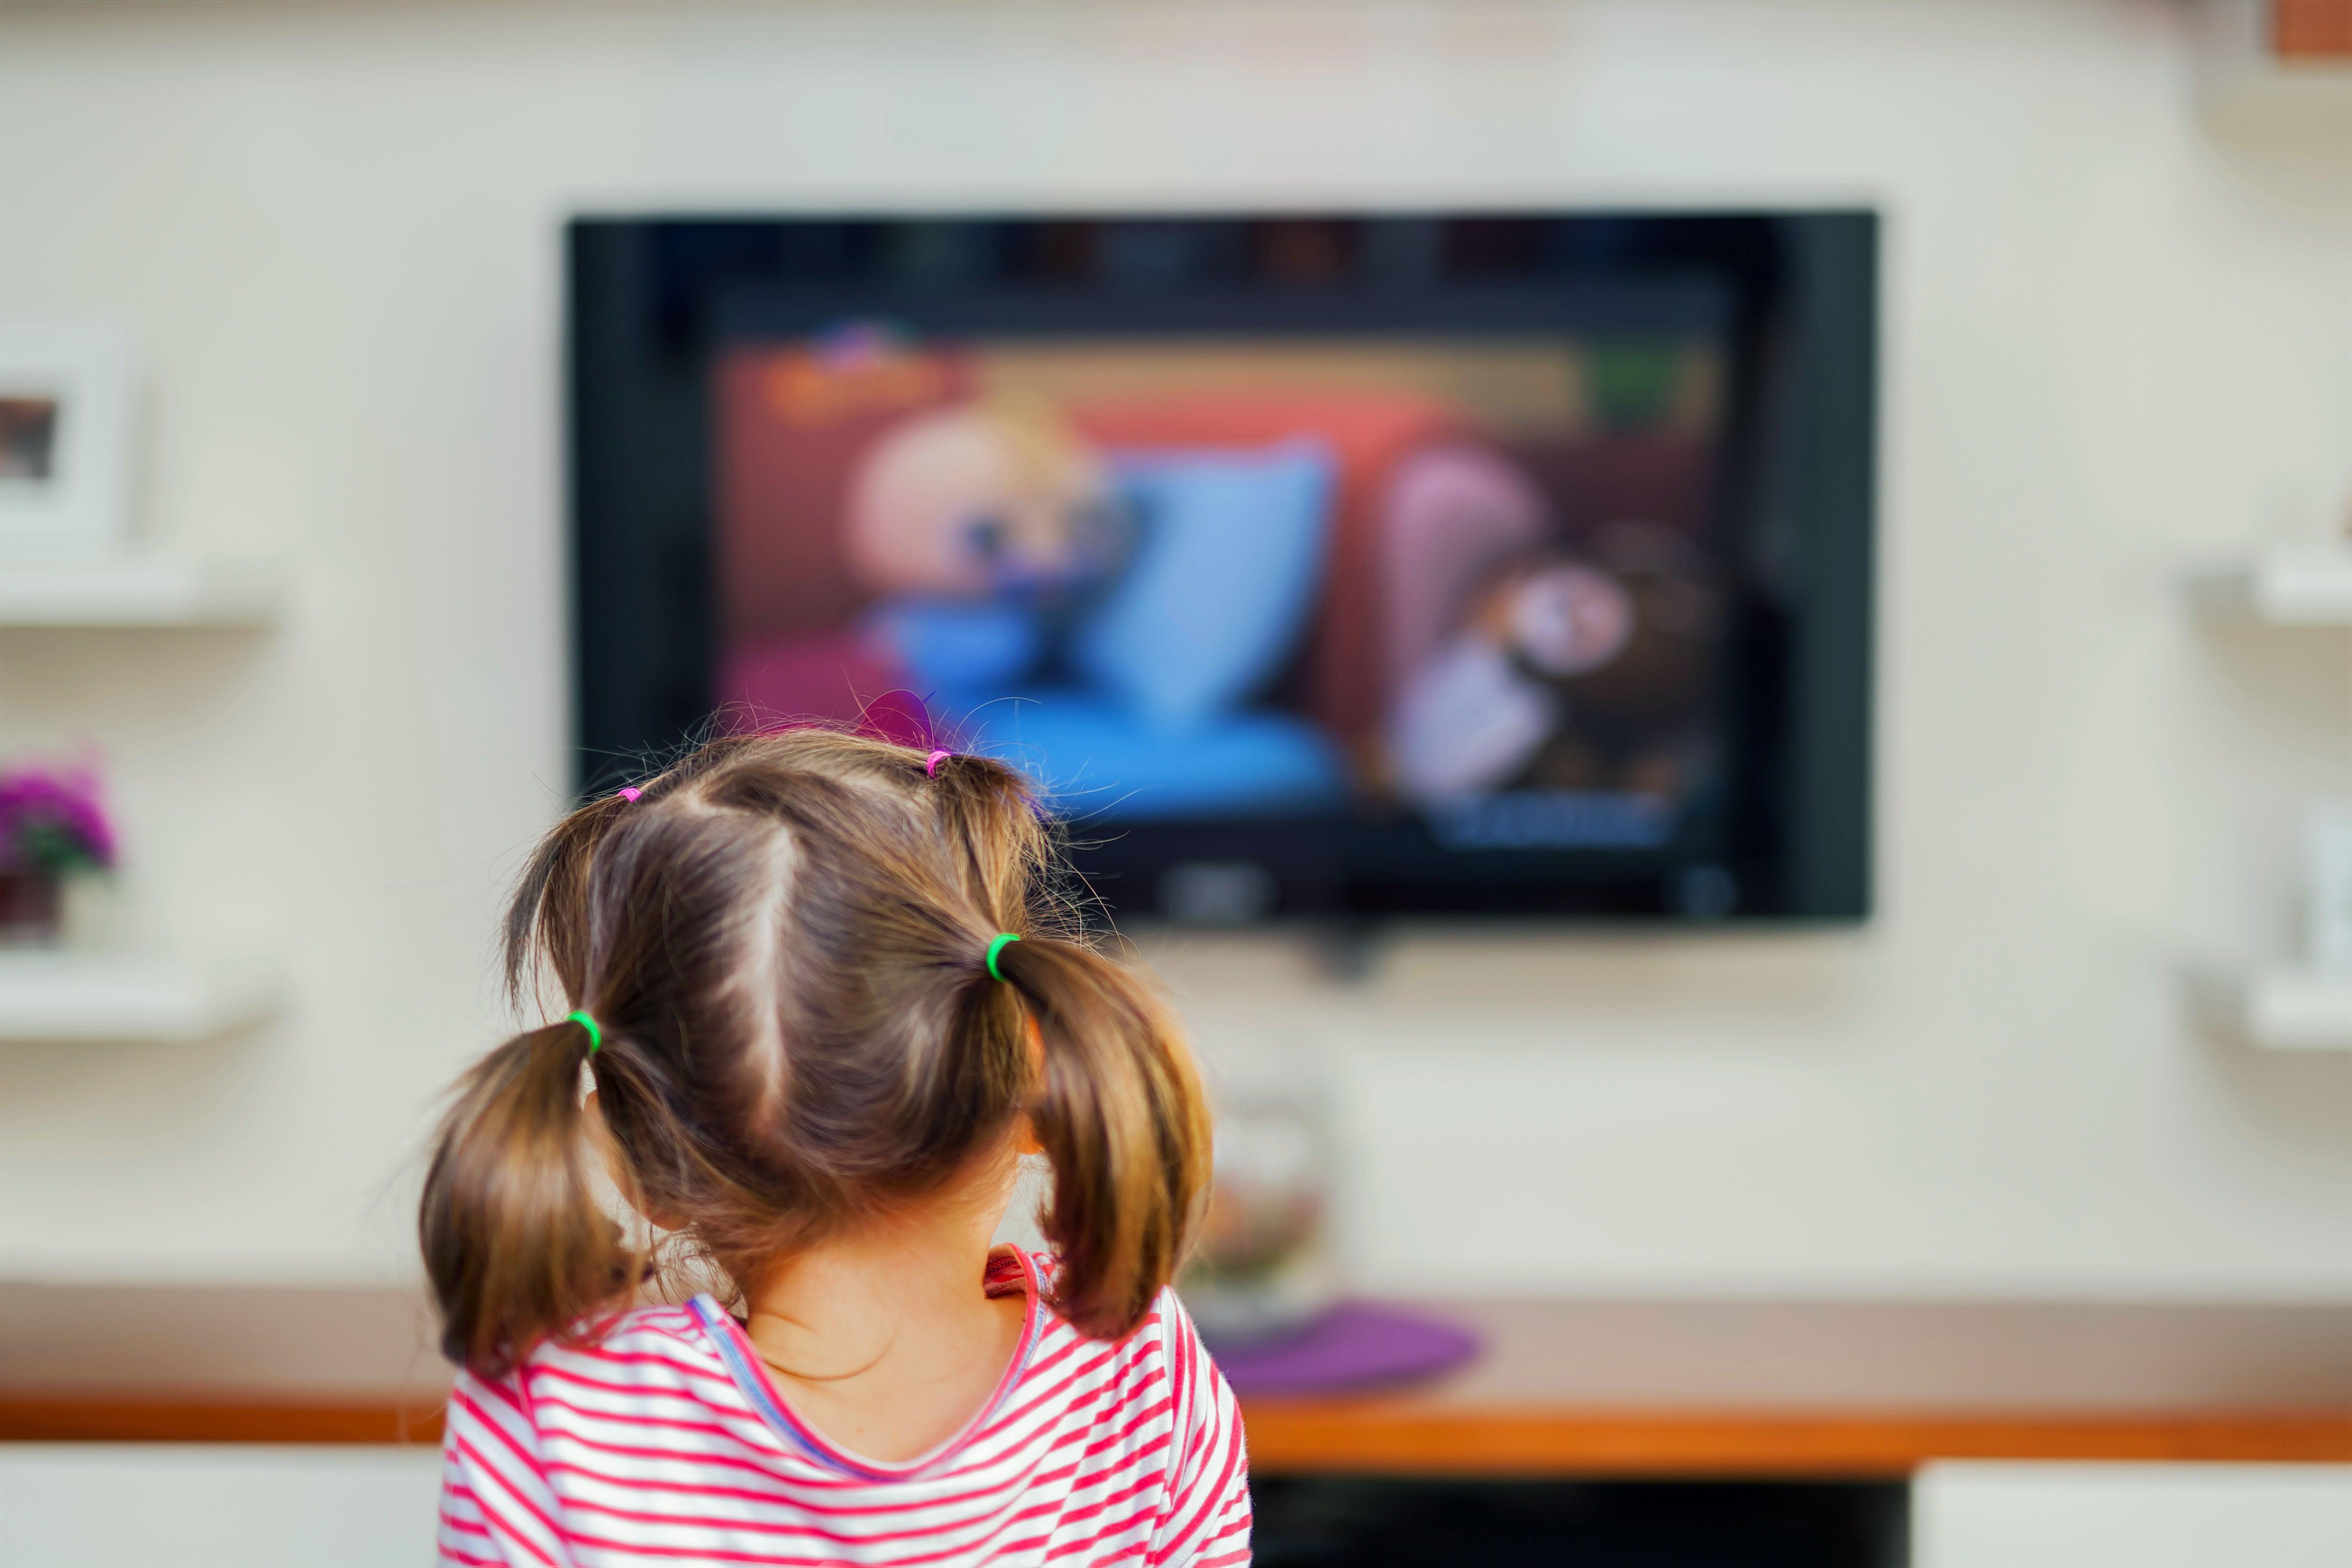 Child using screen technology